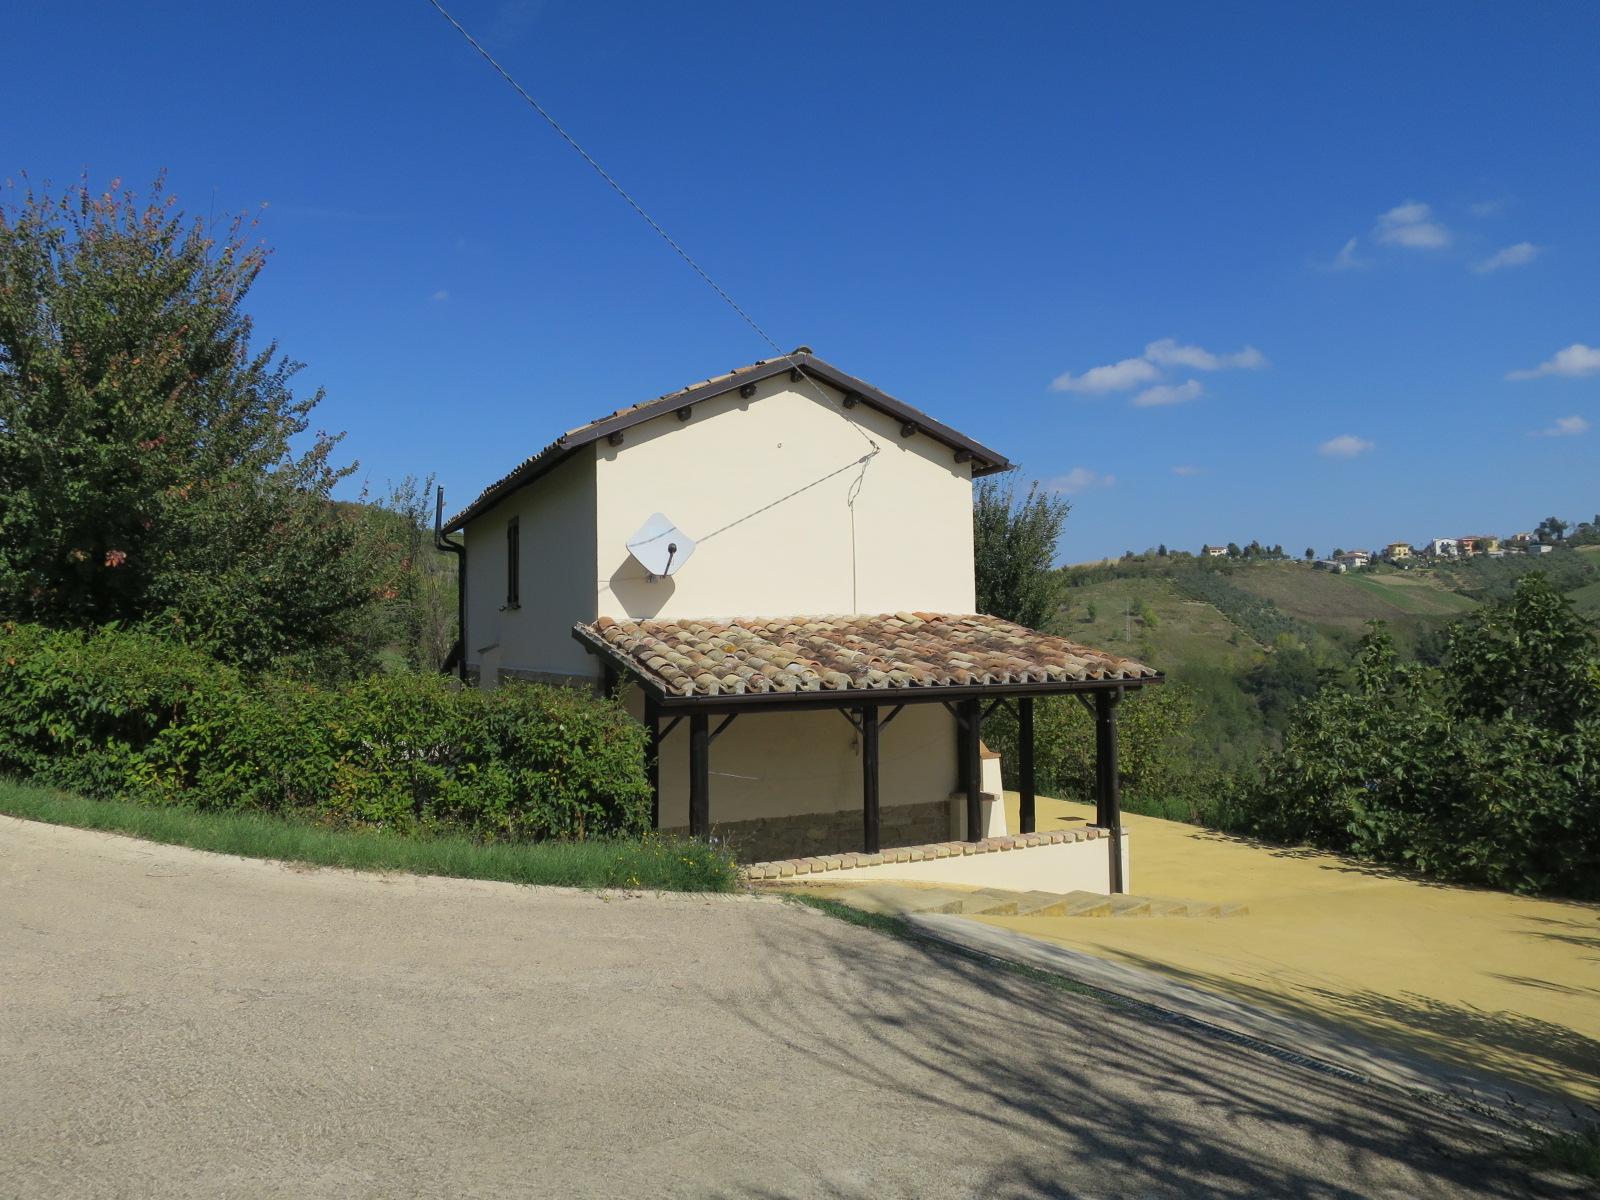 Country Houses Country Houses for sale Montefino (TE), Casa Collina - Montefino - EUR 151.447 280